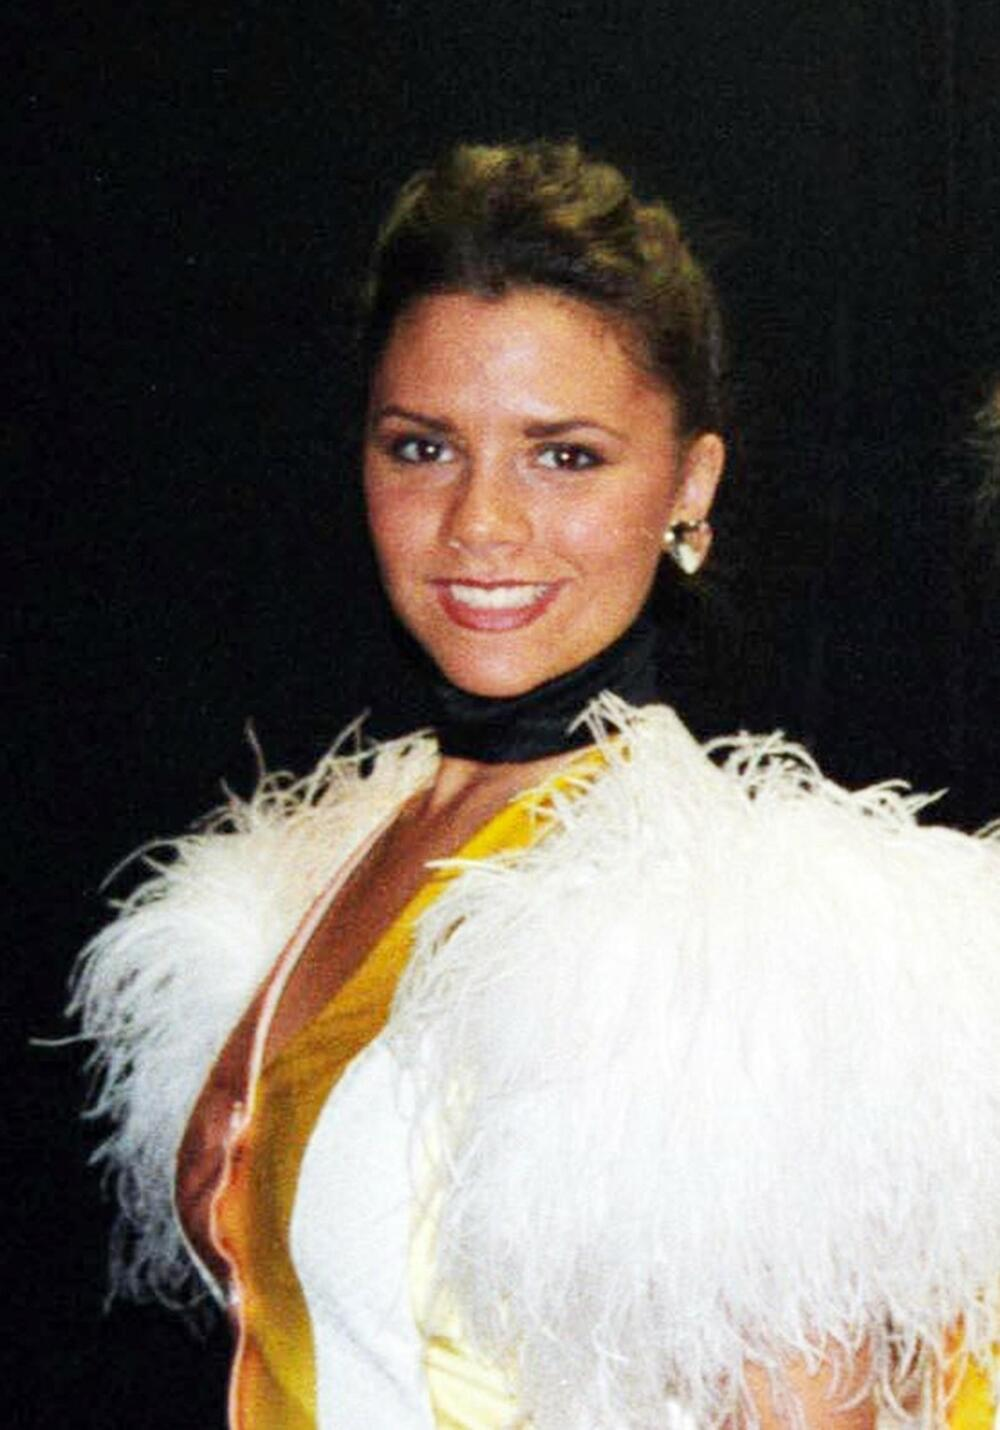 Viktorija Bekam